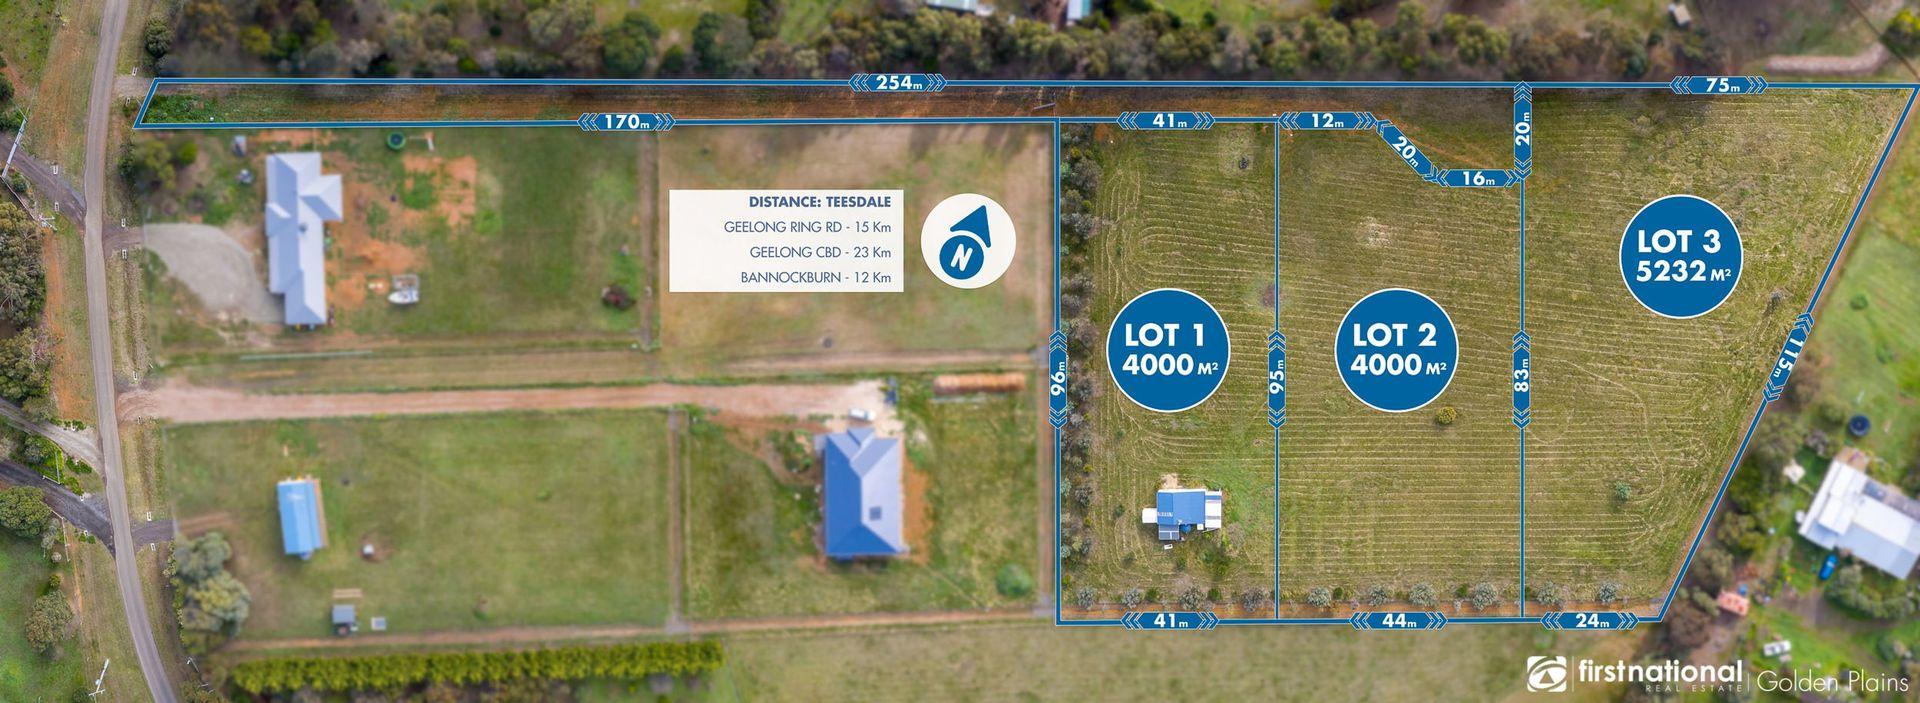 Lot 1, 120 Eagle Court, Teesdale VIC 3328, Image 1